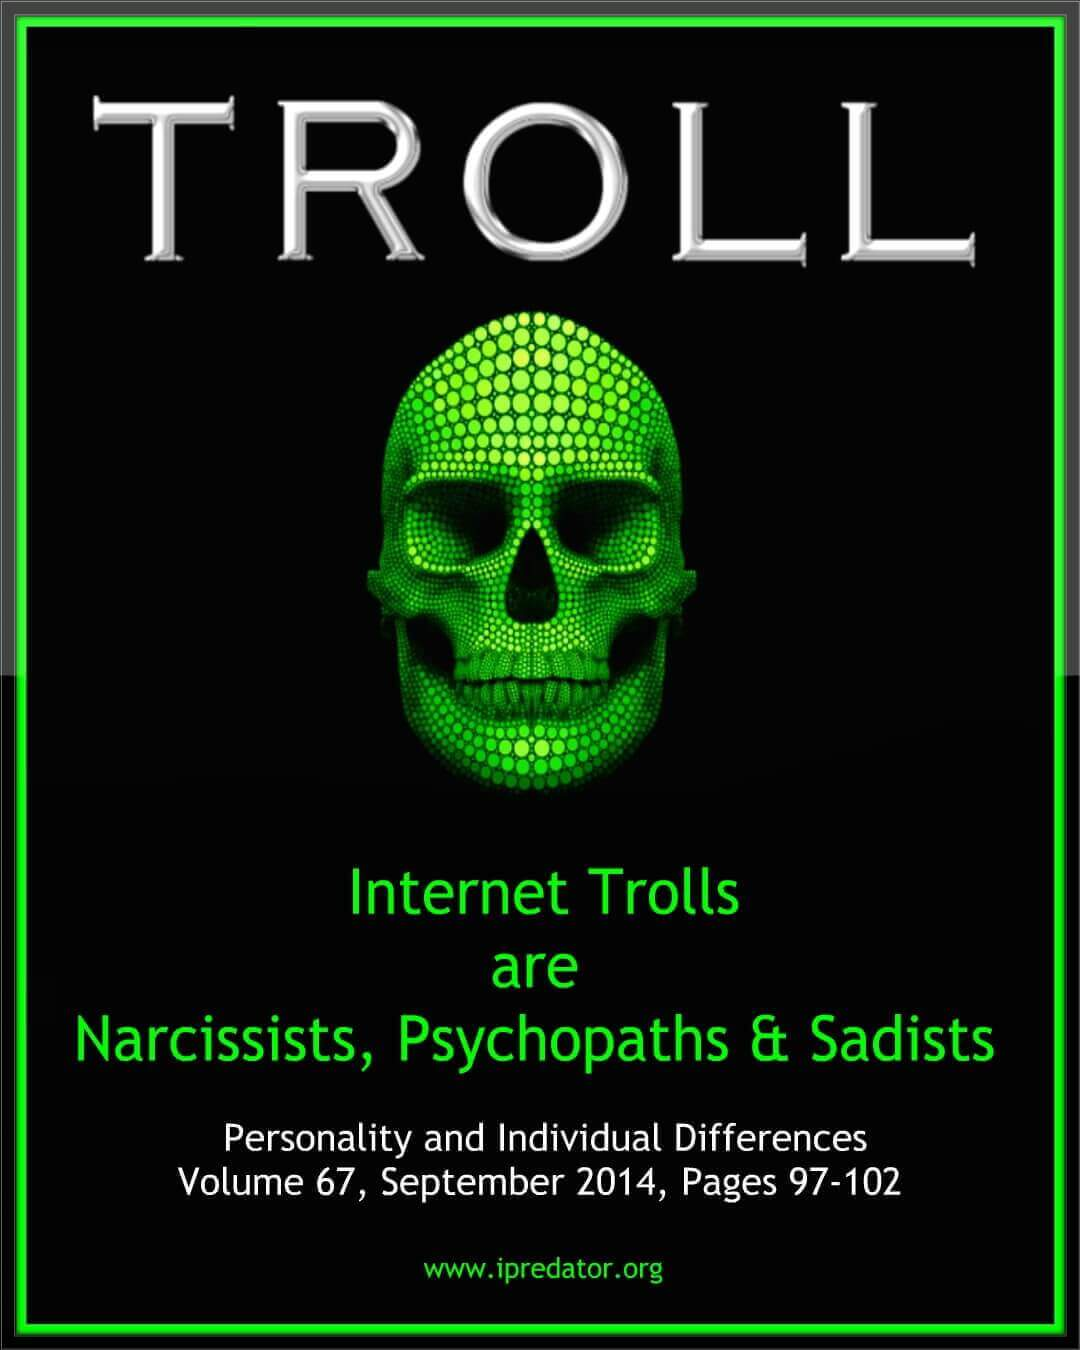 michael-nuccitelli-internet-troll-image-16